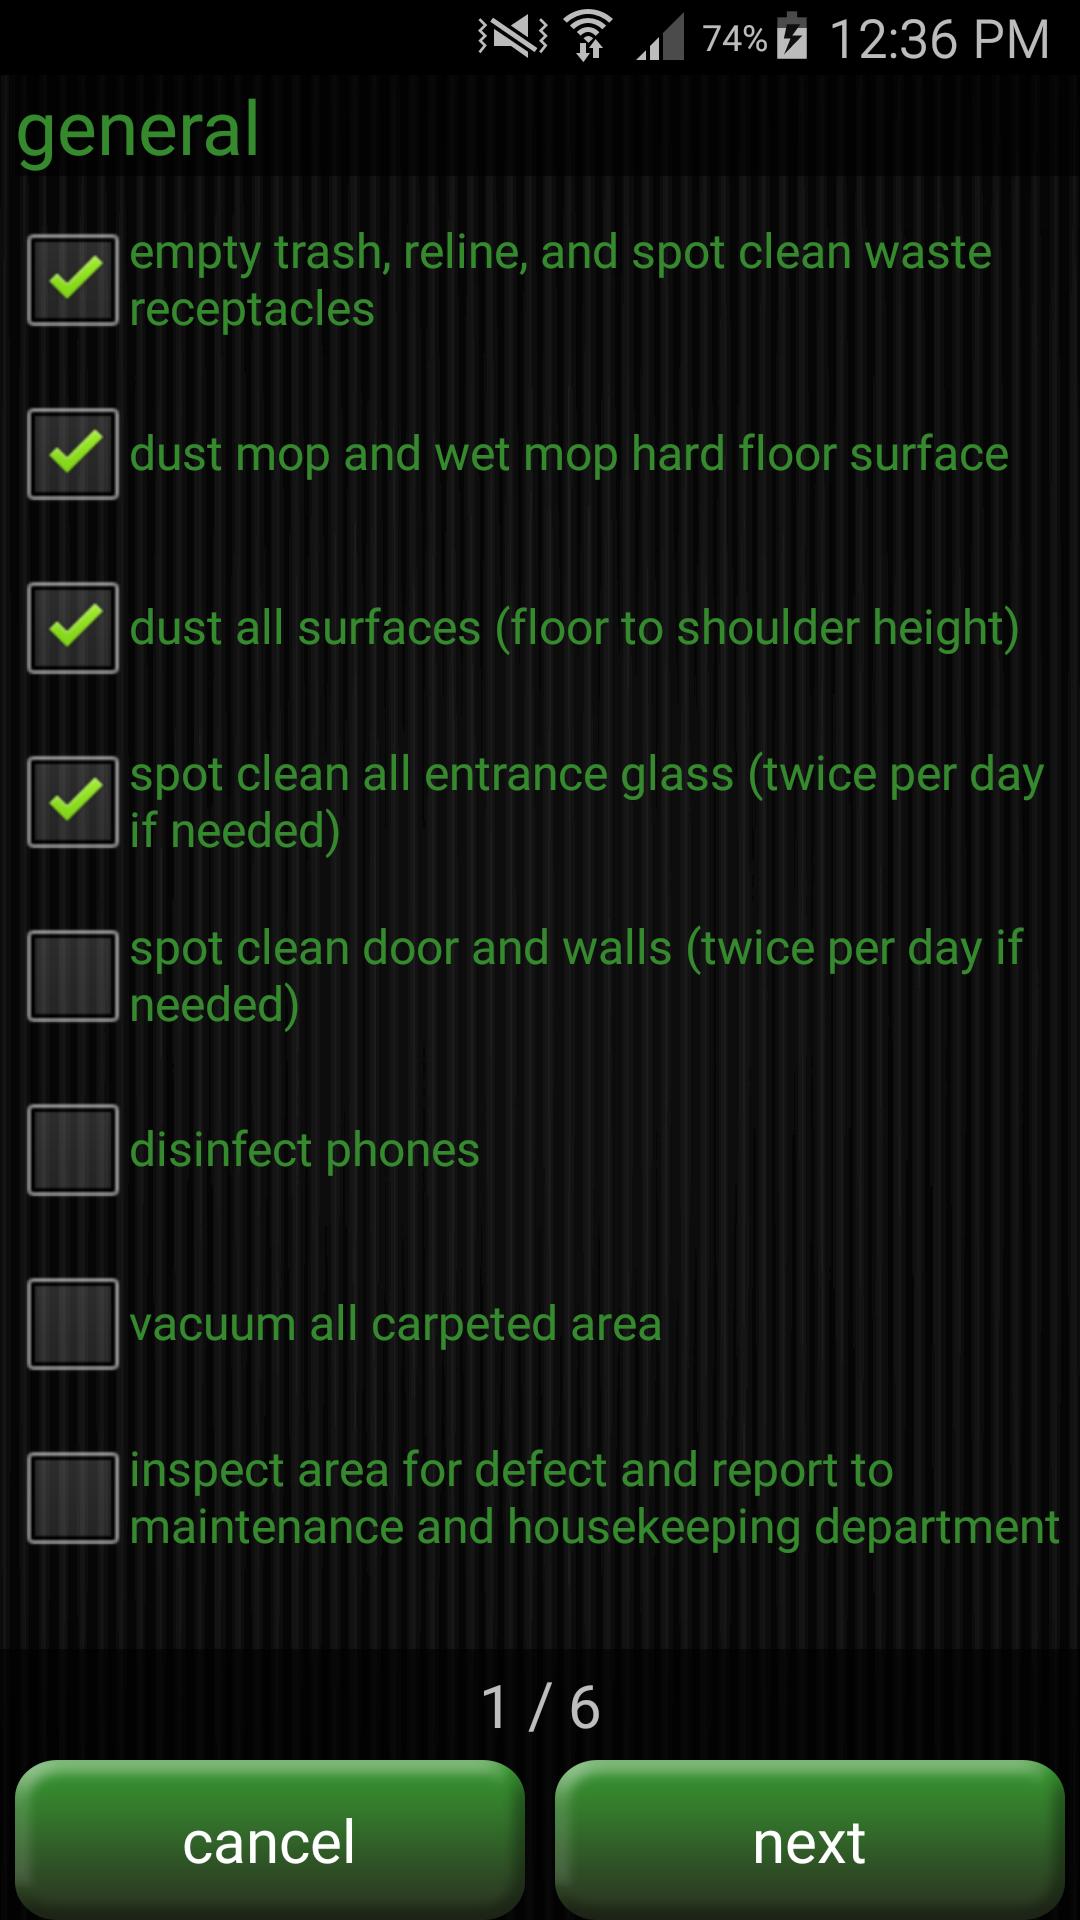 ginstr_app_hotelPublicAreaChecklist_EN_3